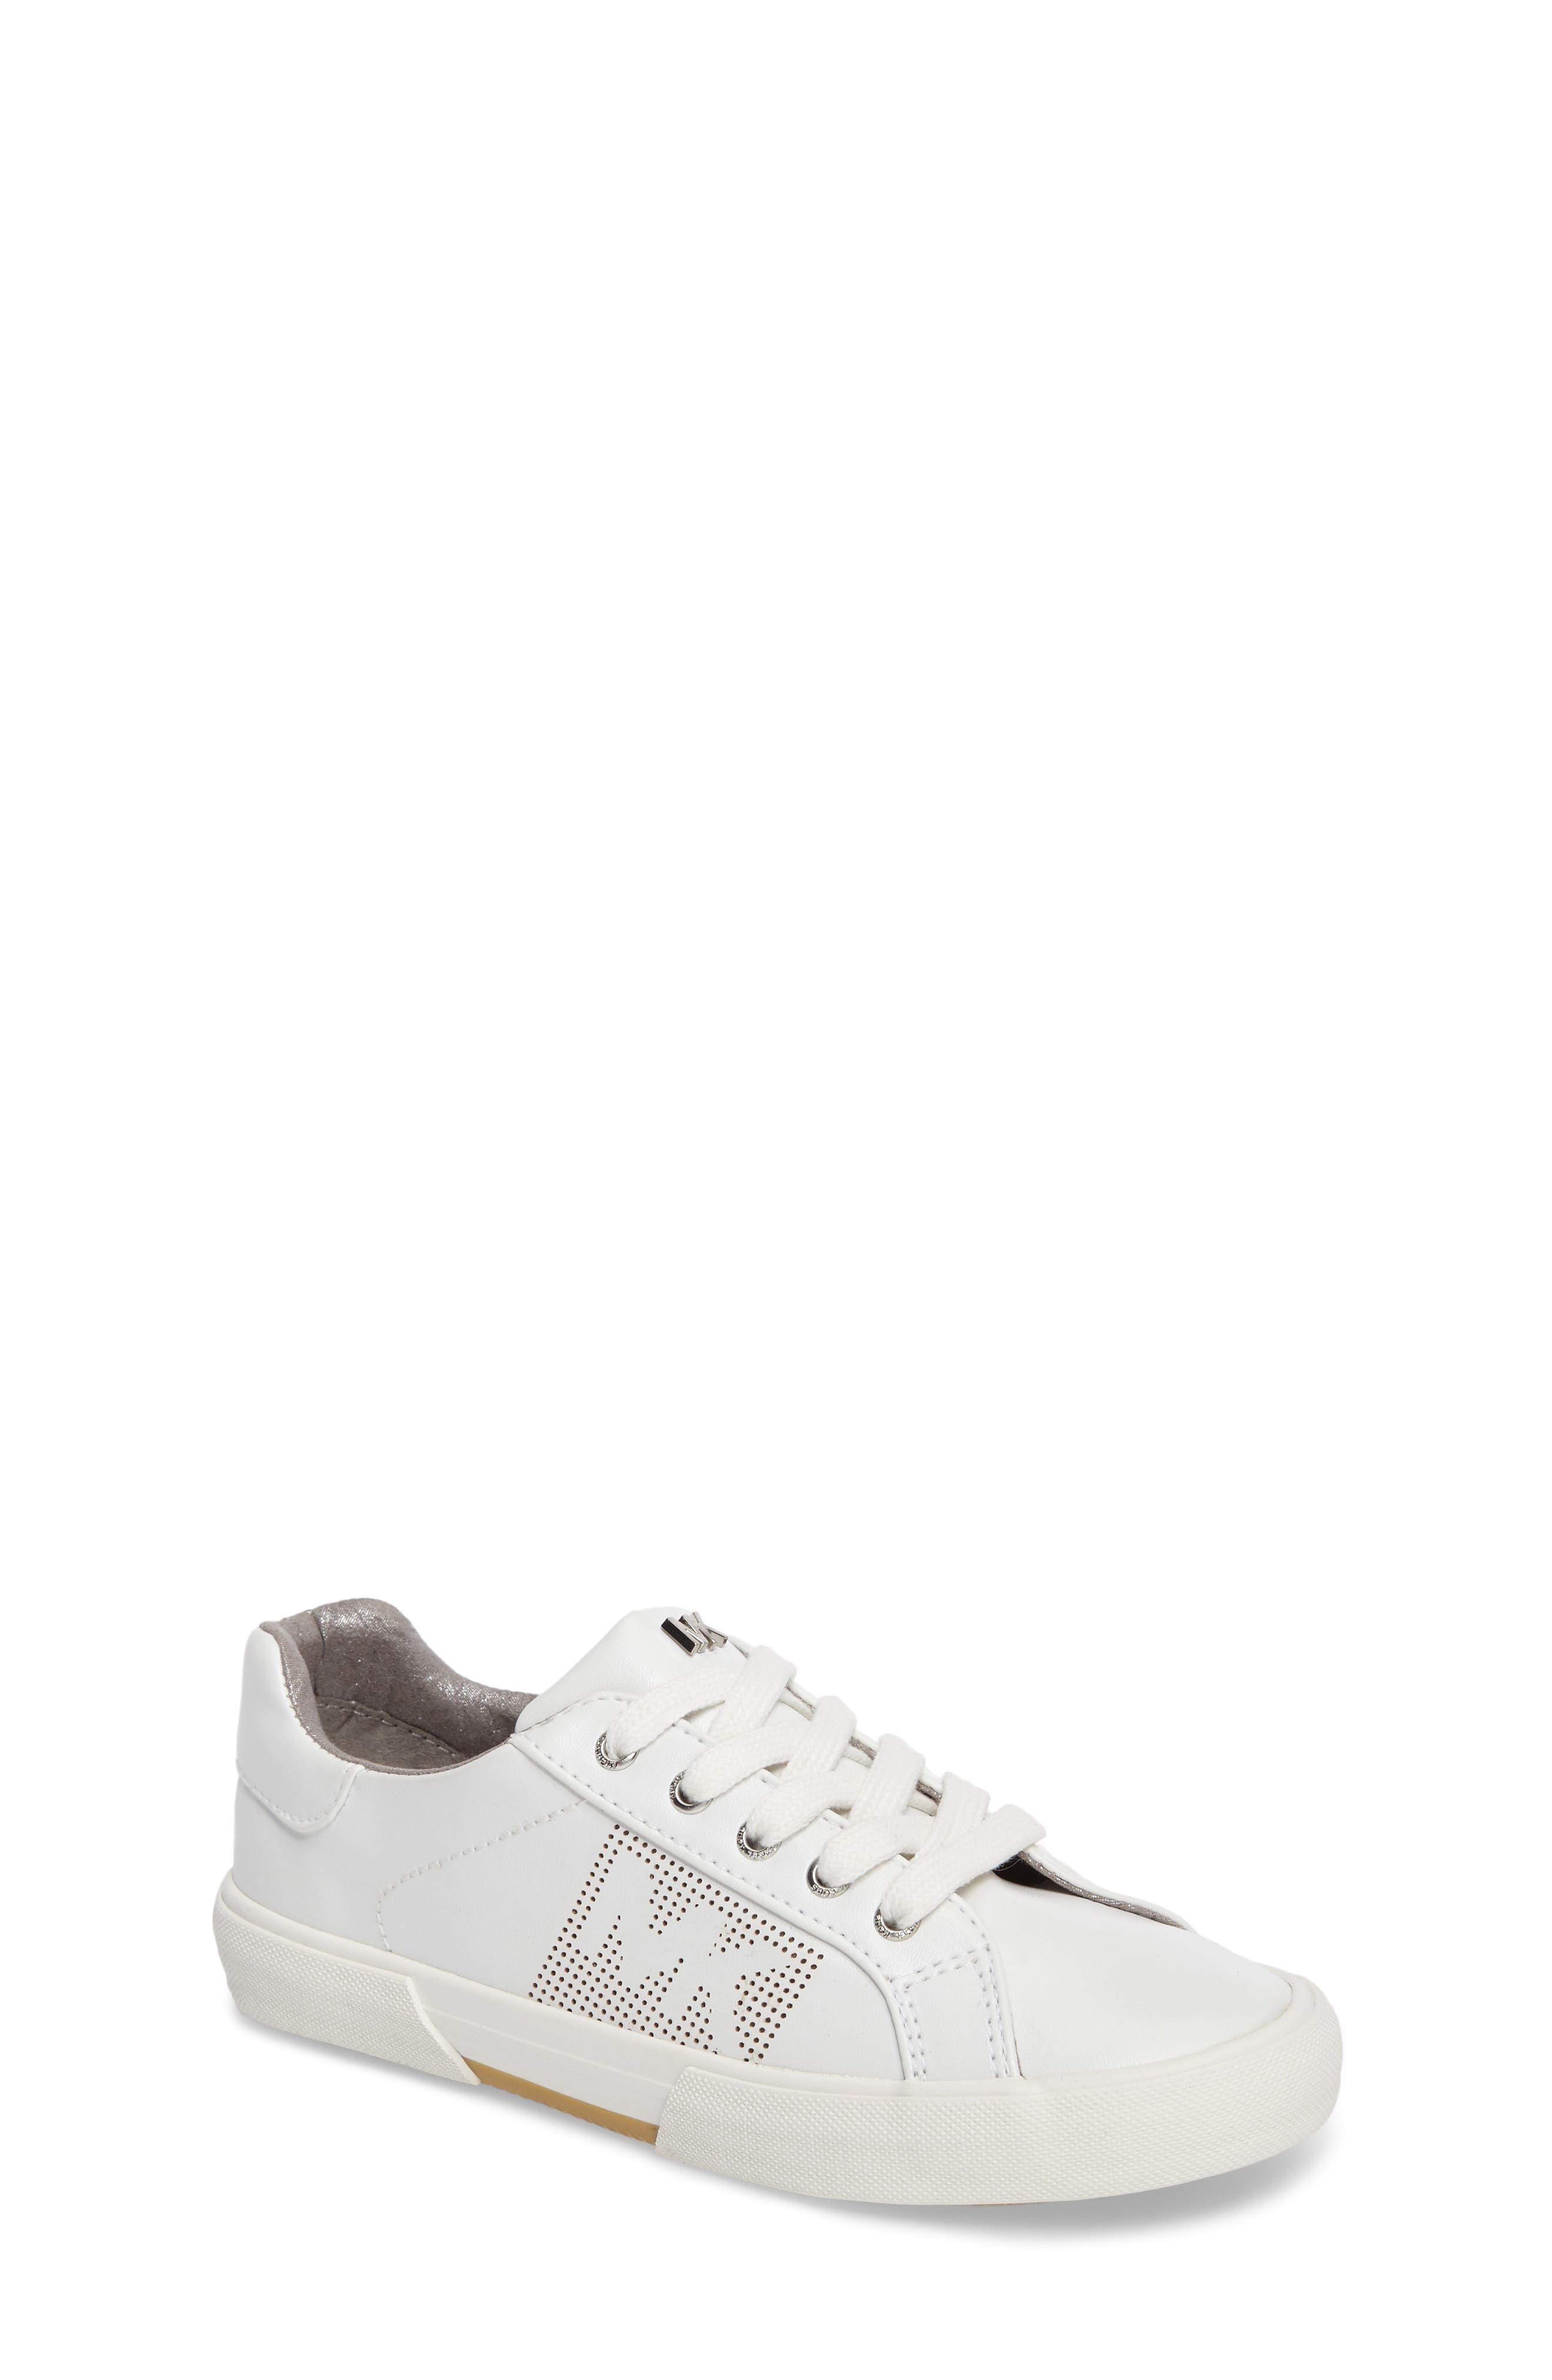 Main Image - MICHAEL Michael Kors Ima Court Sneaker (Walker, Toddler, Little Kid & Big Kid)